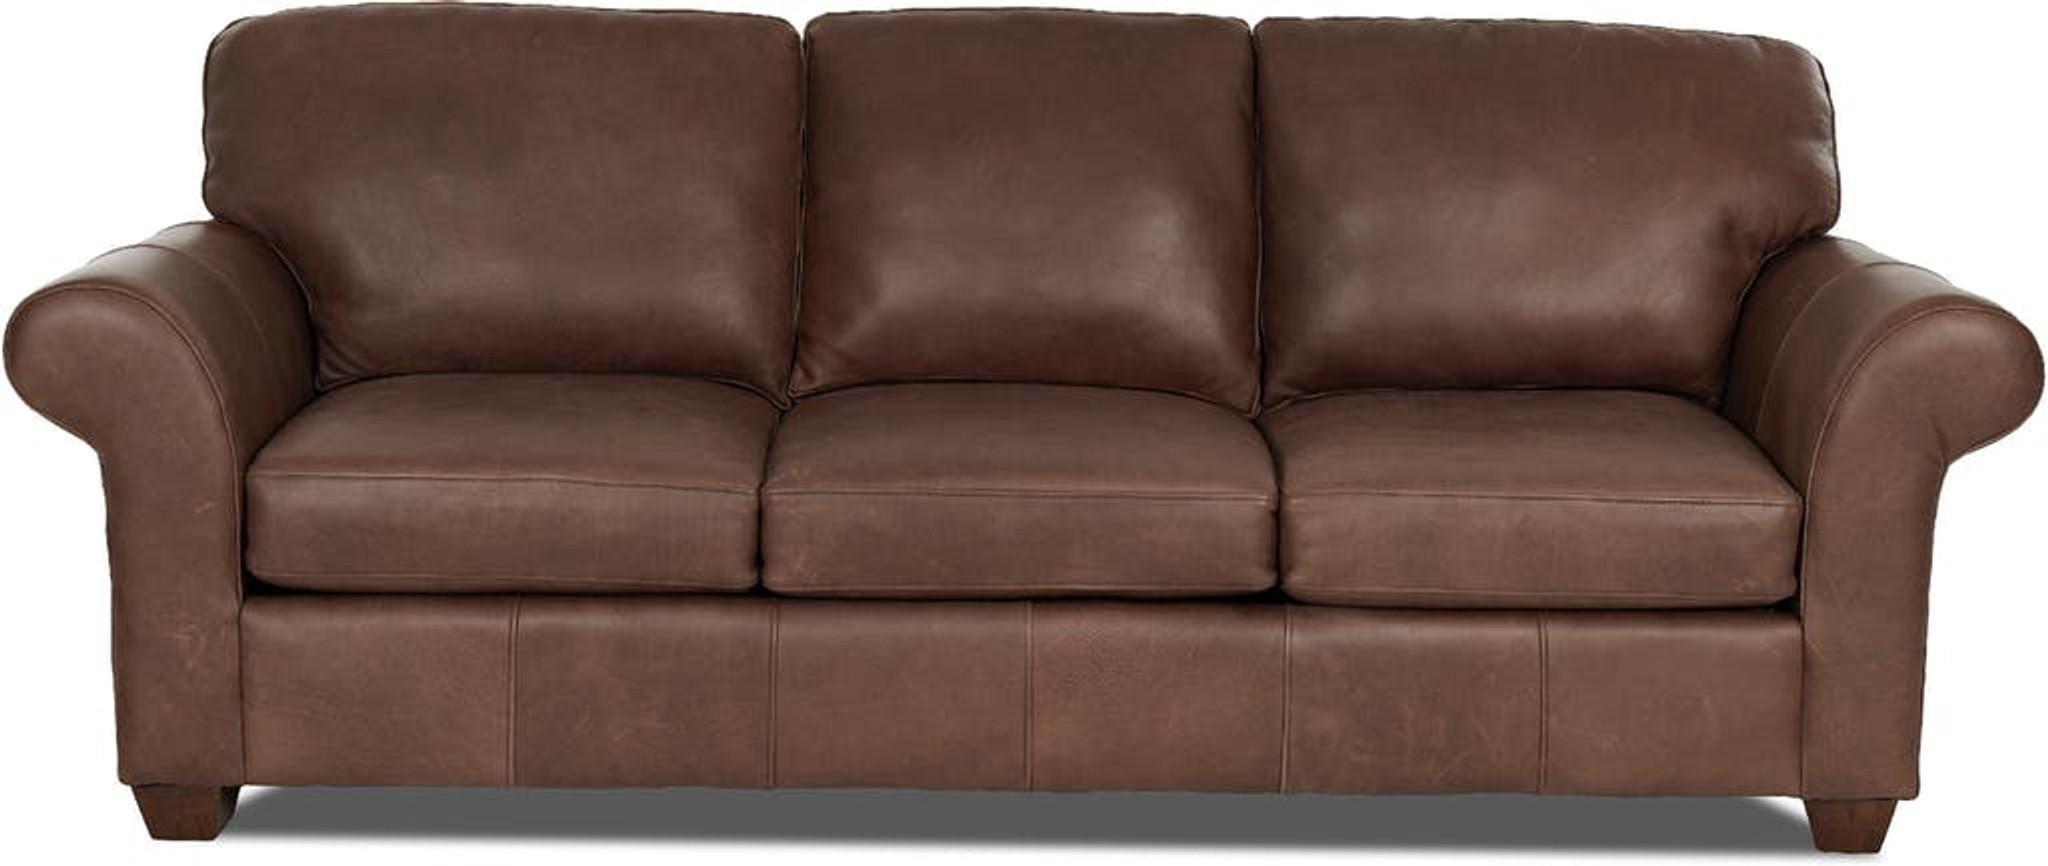 Leather Sofa   Roy\'s Furniture Chicago   Designer Furniture